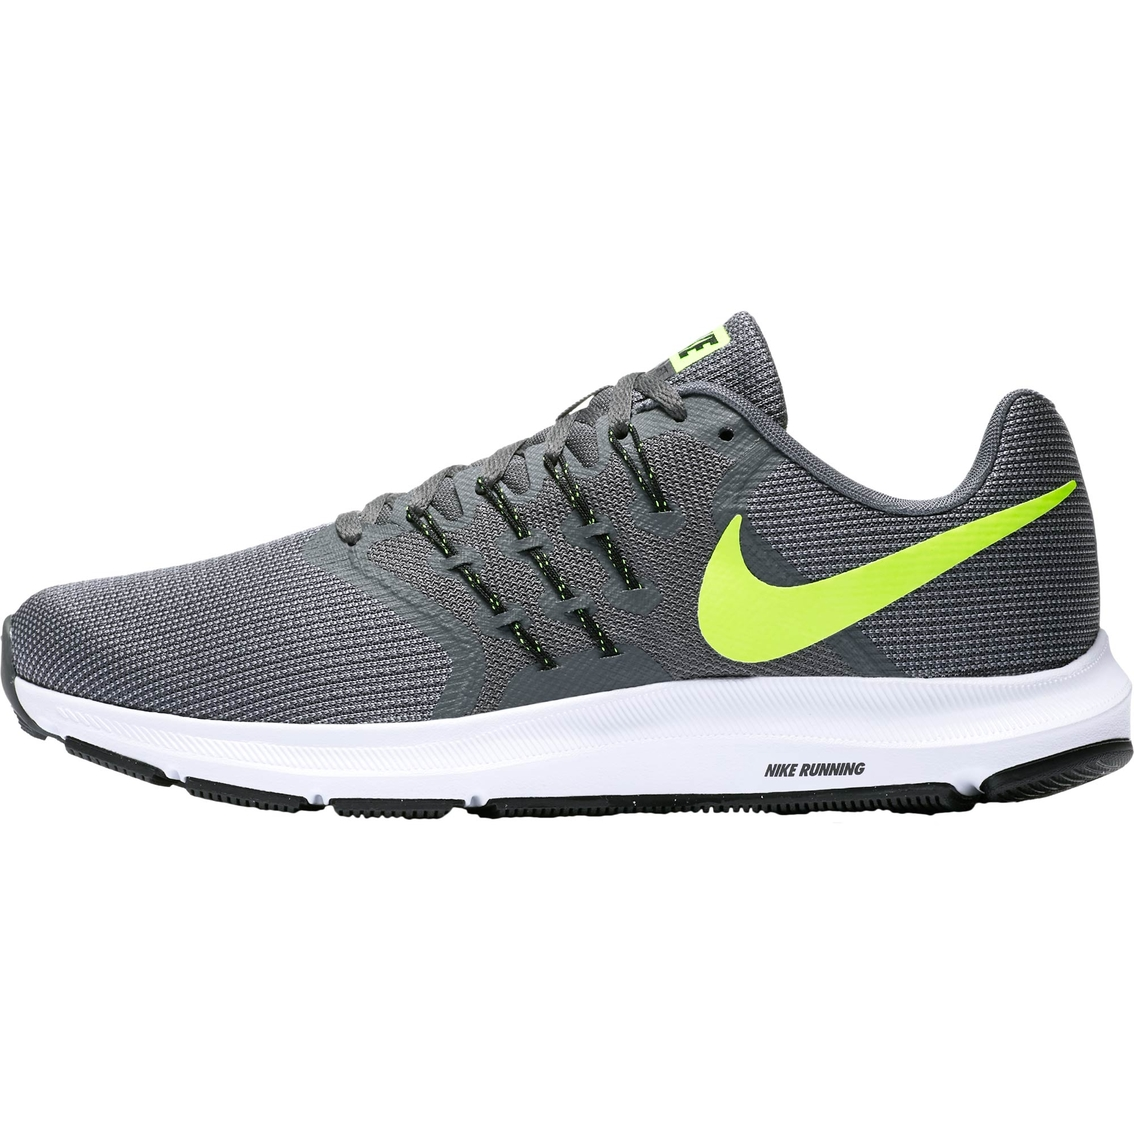 4f0cc14ffd1 Nike Men s Run Swift Running Shoes